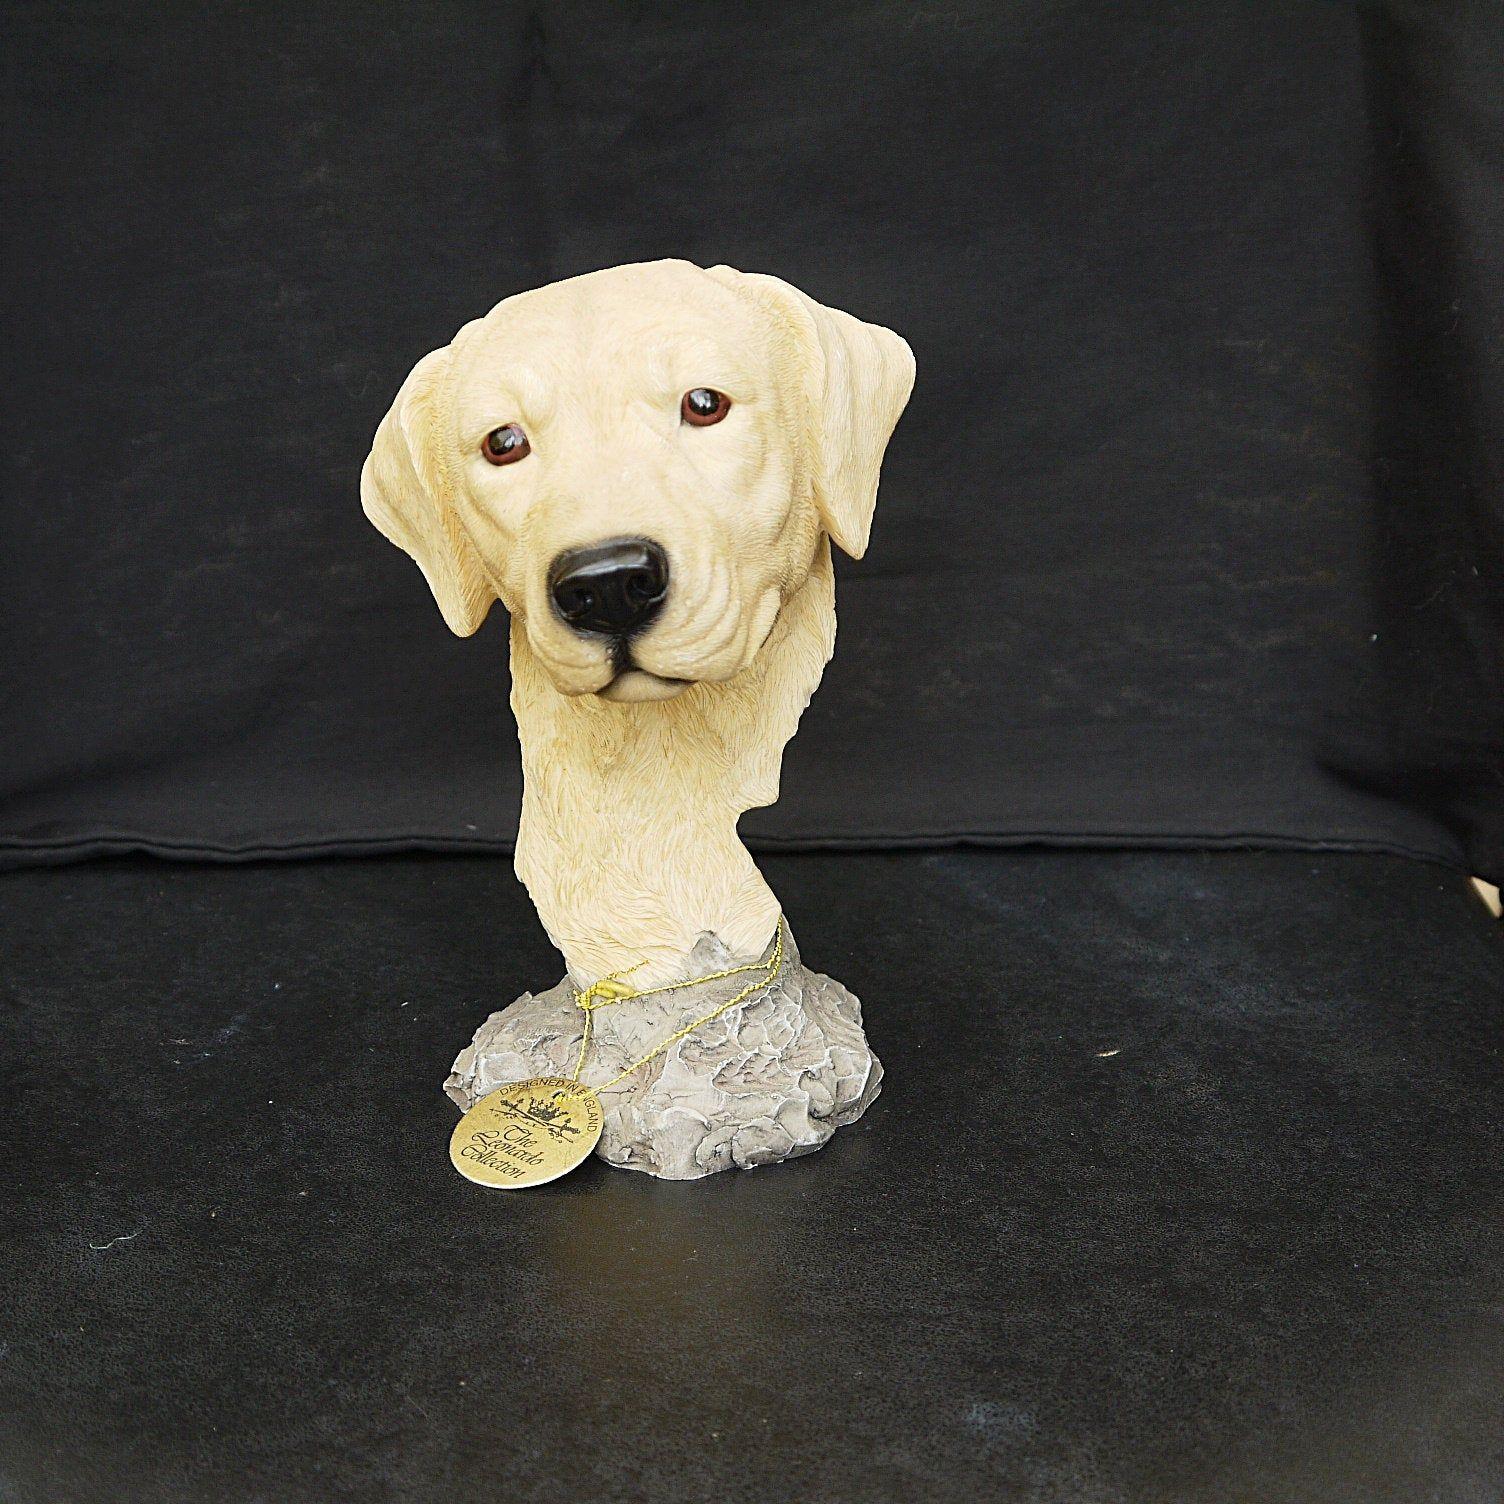 Leonardo Collection Dog Studies Sitting Large Decorative Ornament Figurine Gift